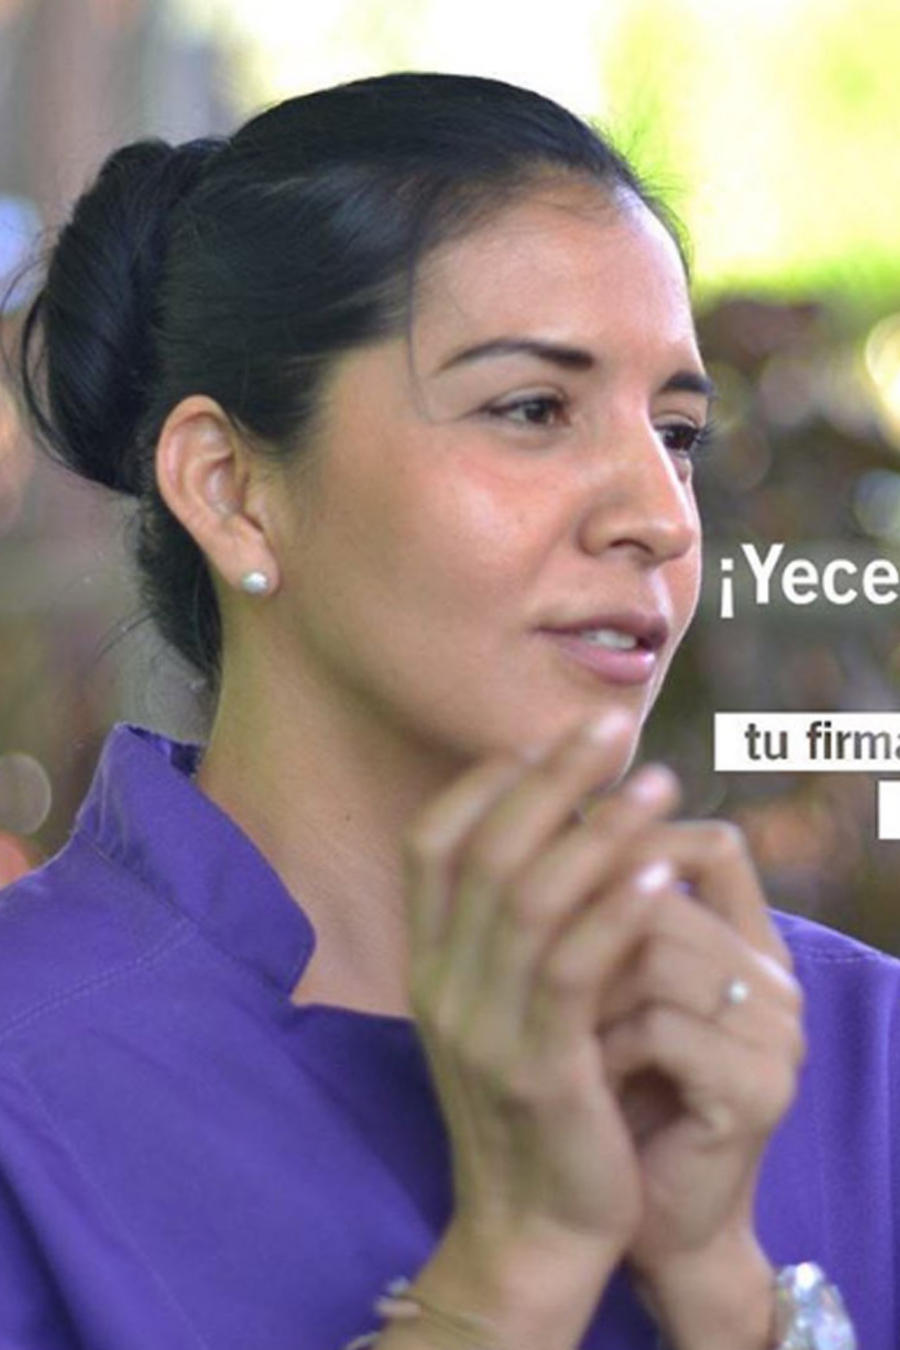 yecenia armenta